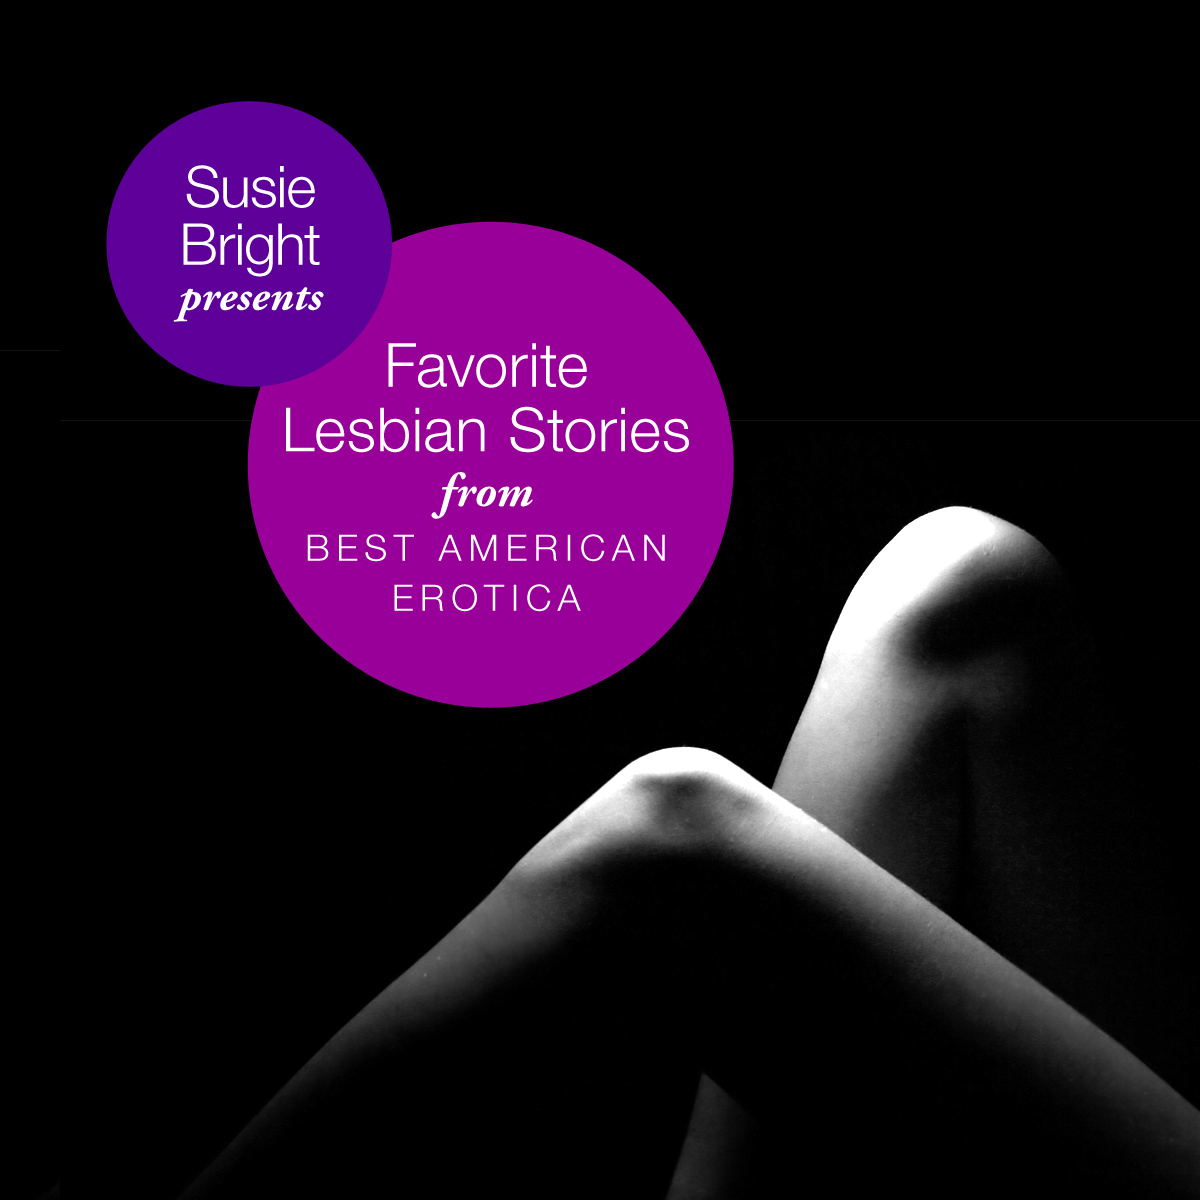 ADBLCRE_608_SusieBright_v2r3_lesbian.jpg